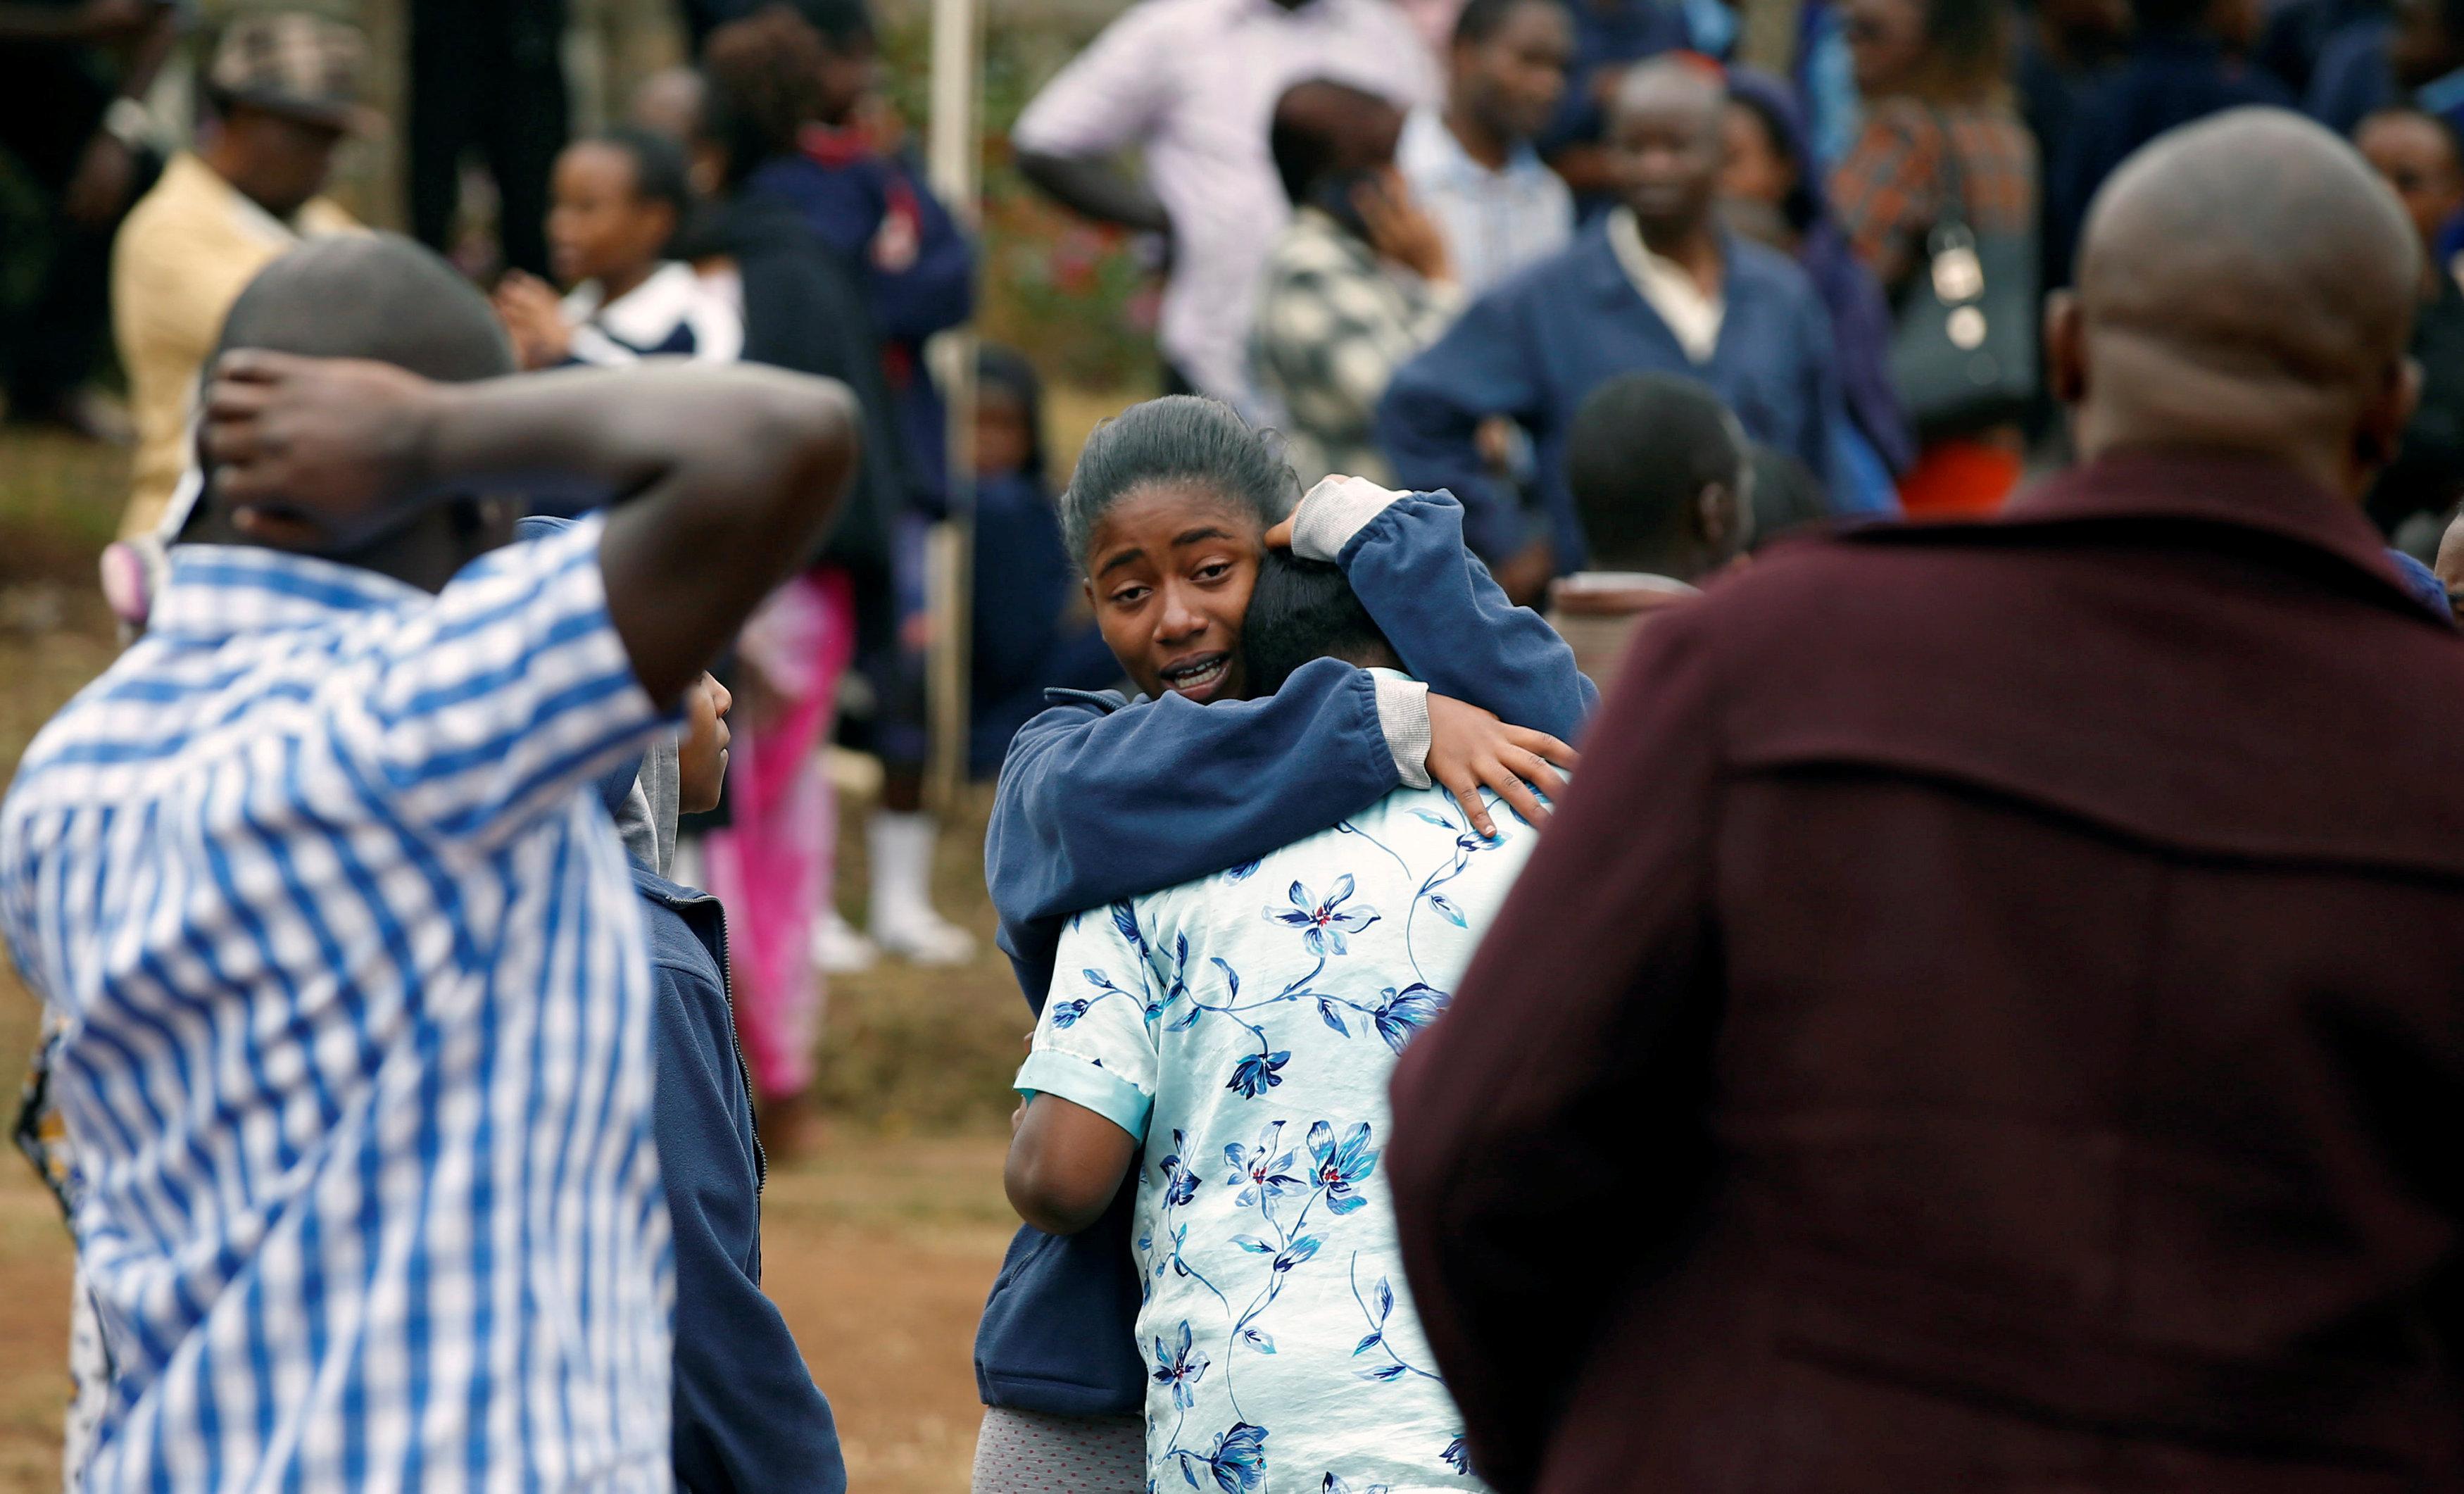 In pictures: Fire at boarding school dormitory in Nairobi, Kenya